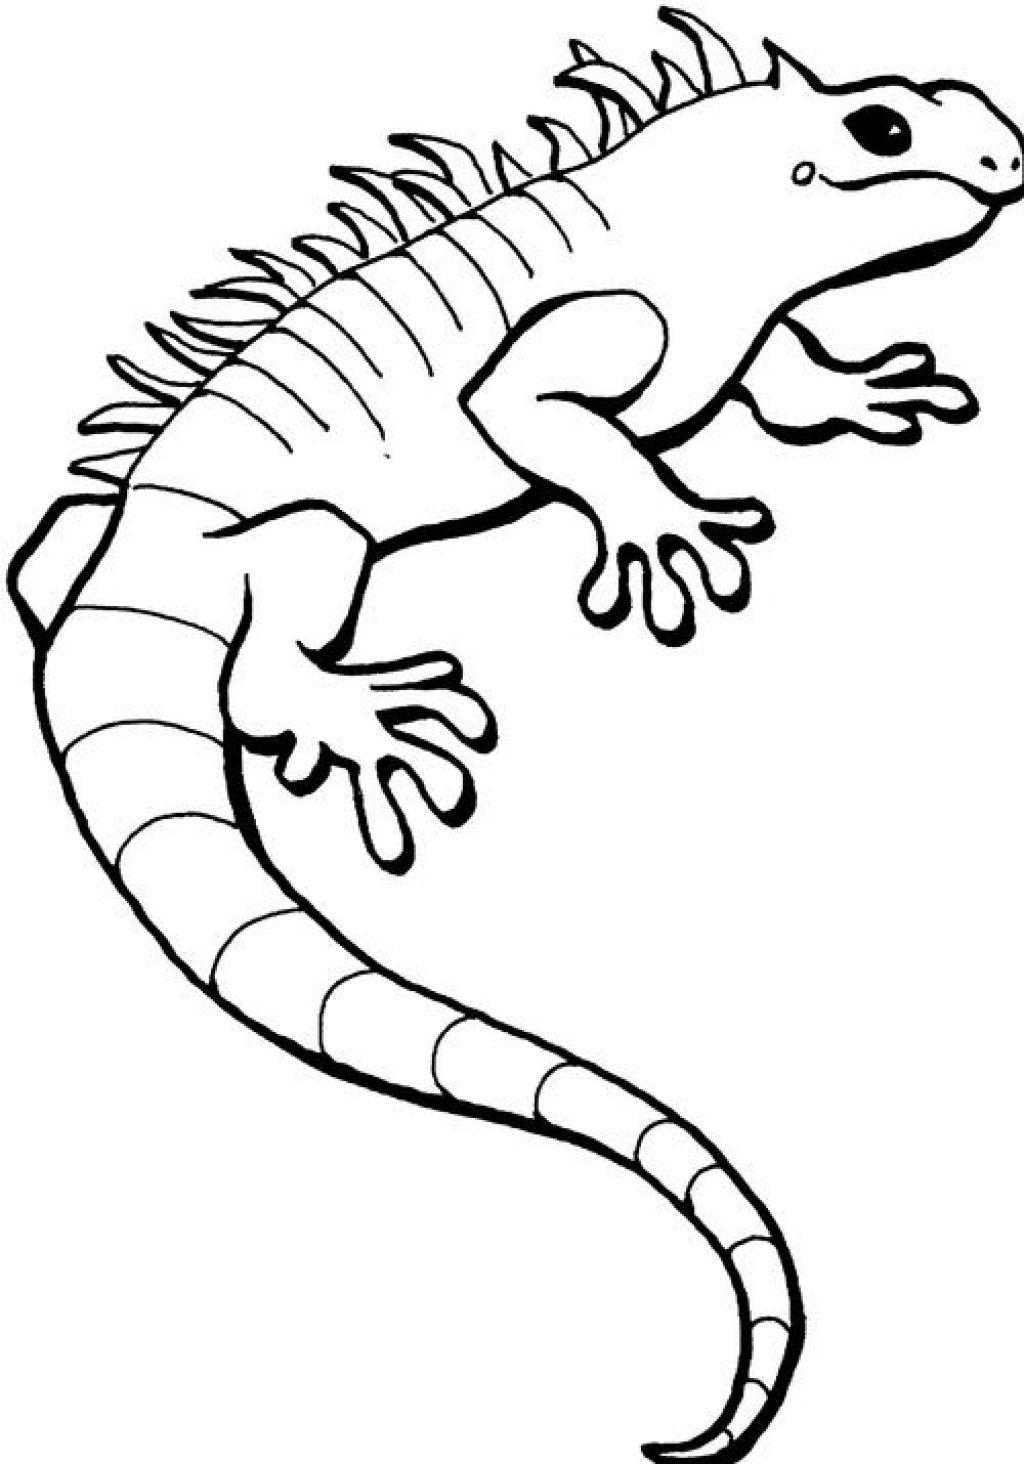 iguana coloring pages free printable iguana coloring pages for kids pages coloring iguana